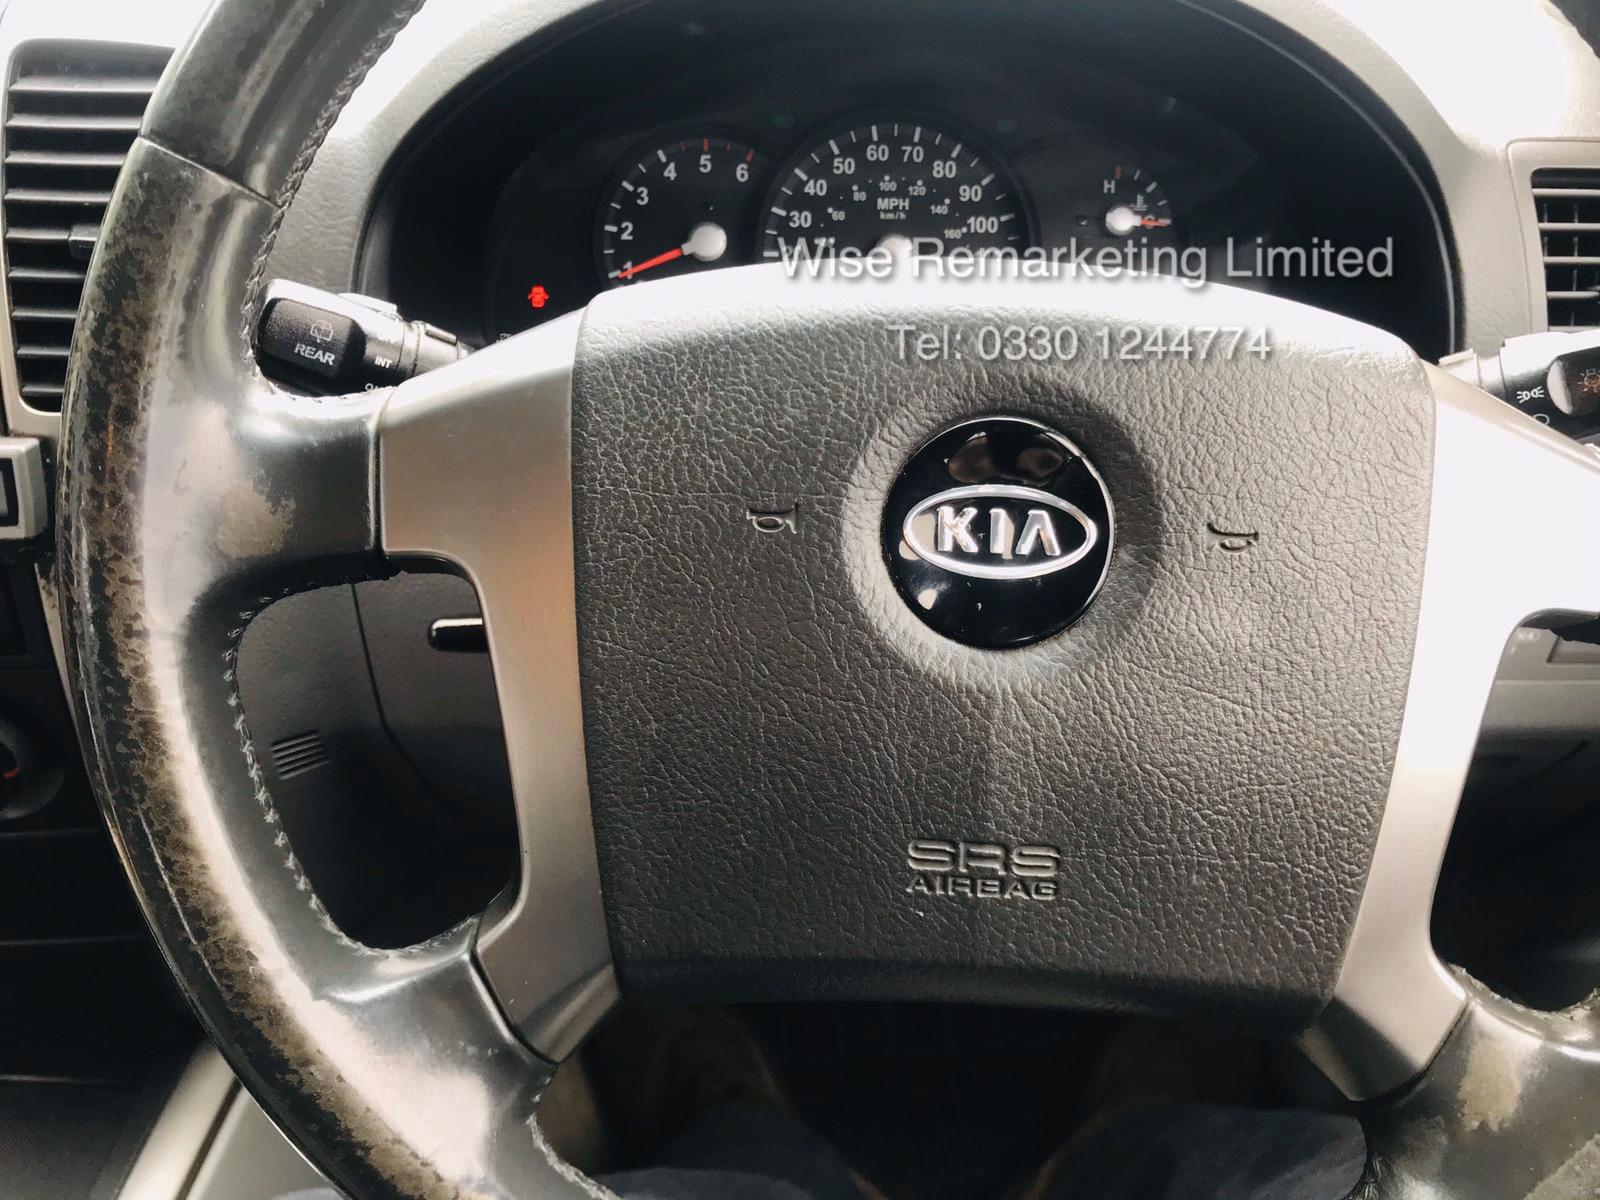 KIA Sorento 2.5 CRDI XE Model (138 BHP) - 2006 06 Reg - 4X4 - Air Con - - Image 21 of 24